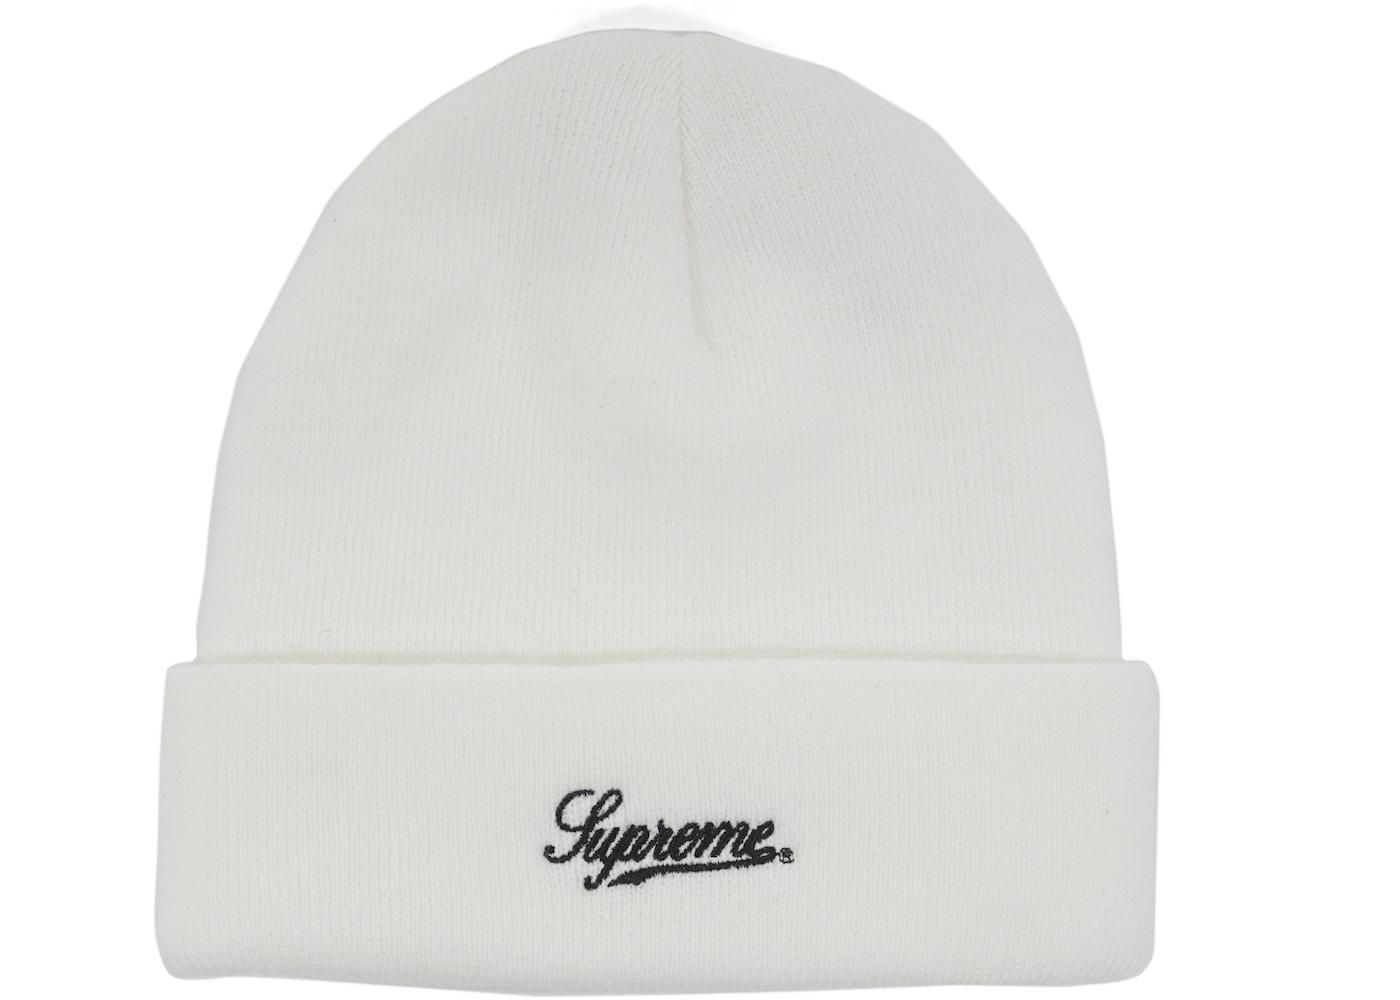 f016cff06d0fa Supreme Scarface Beanie White - FW17